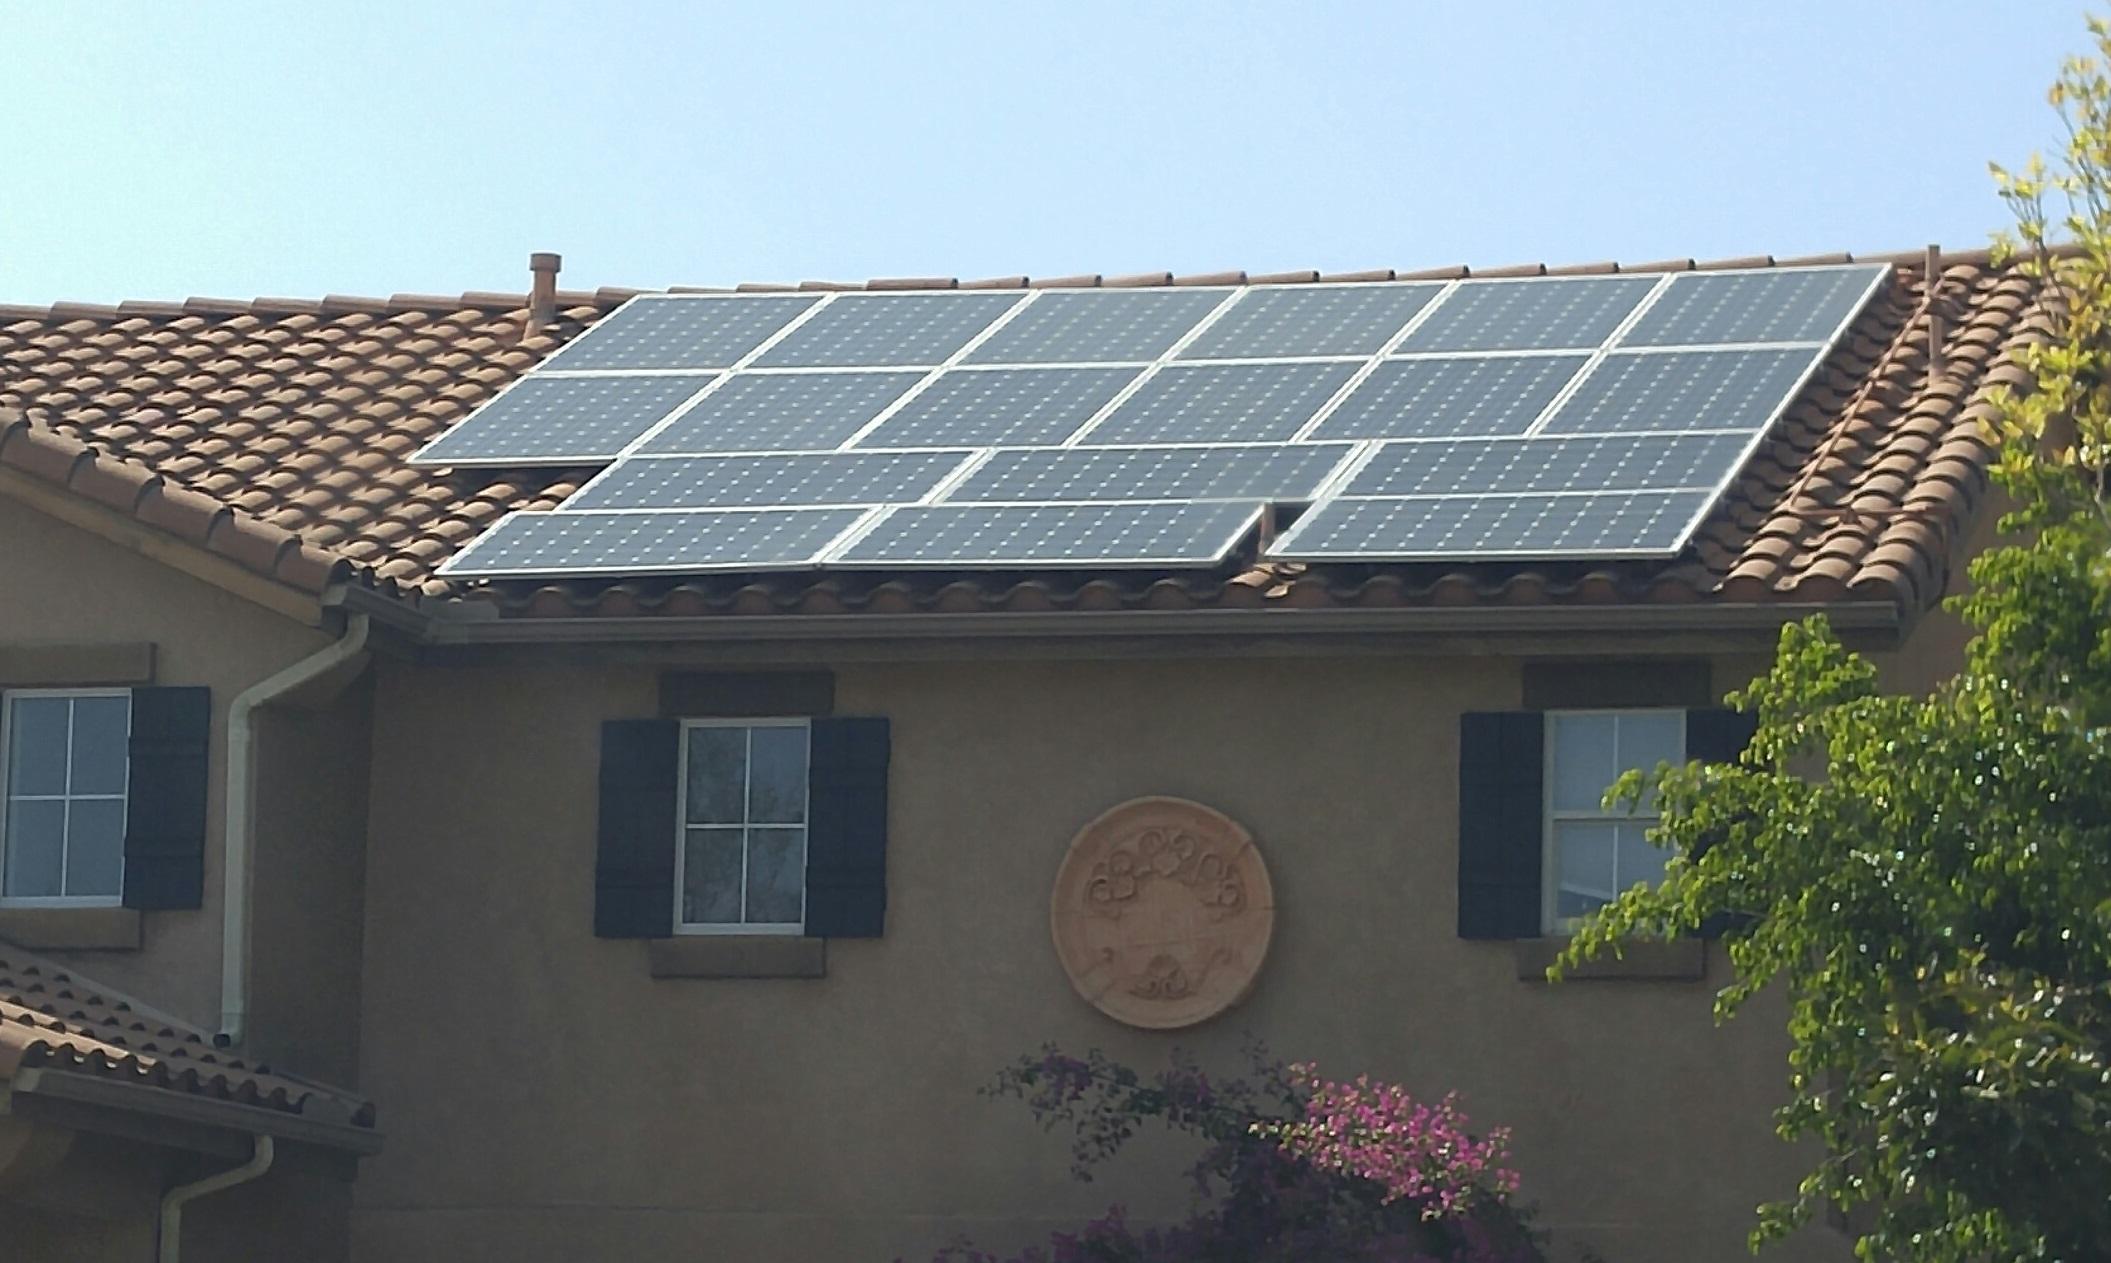 Residential Solar Power System Installed